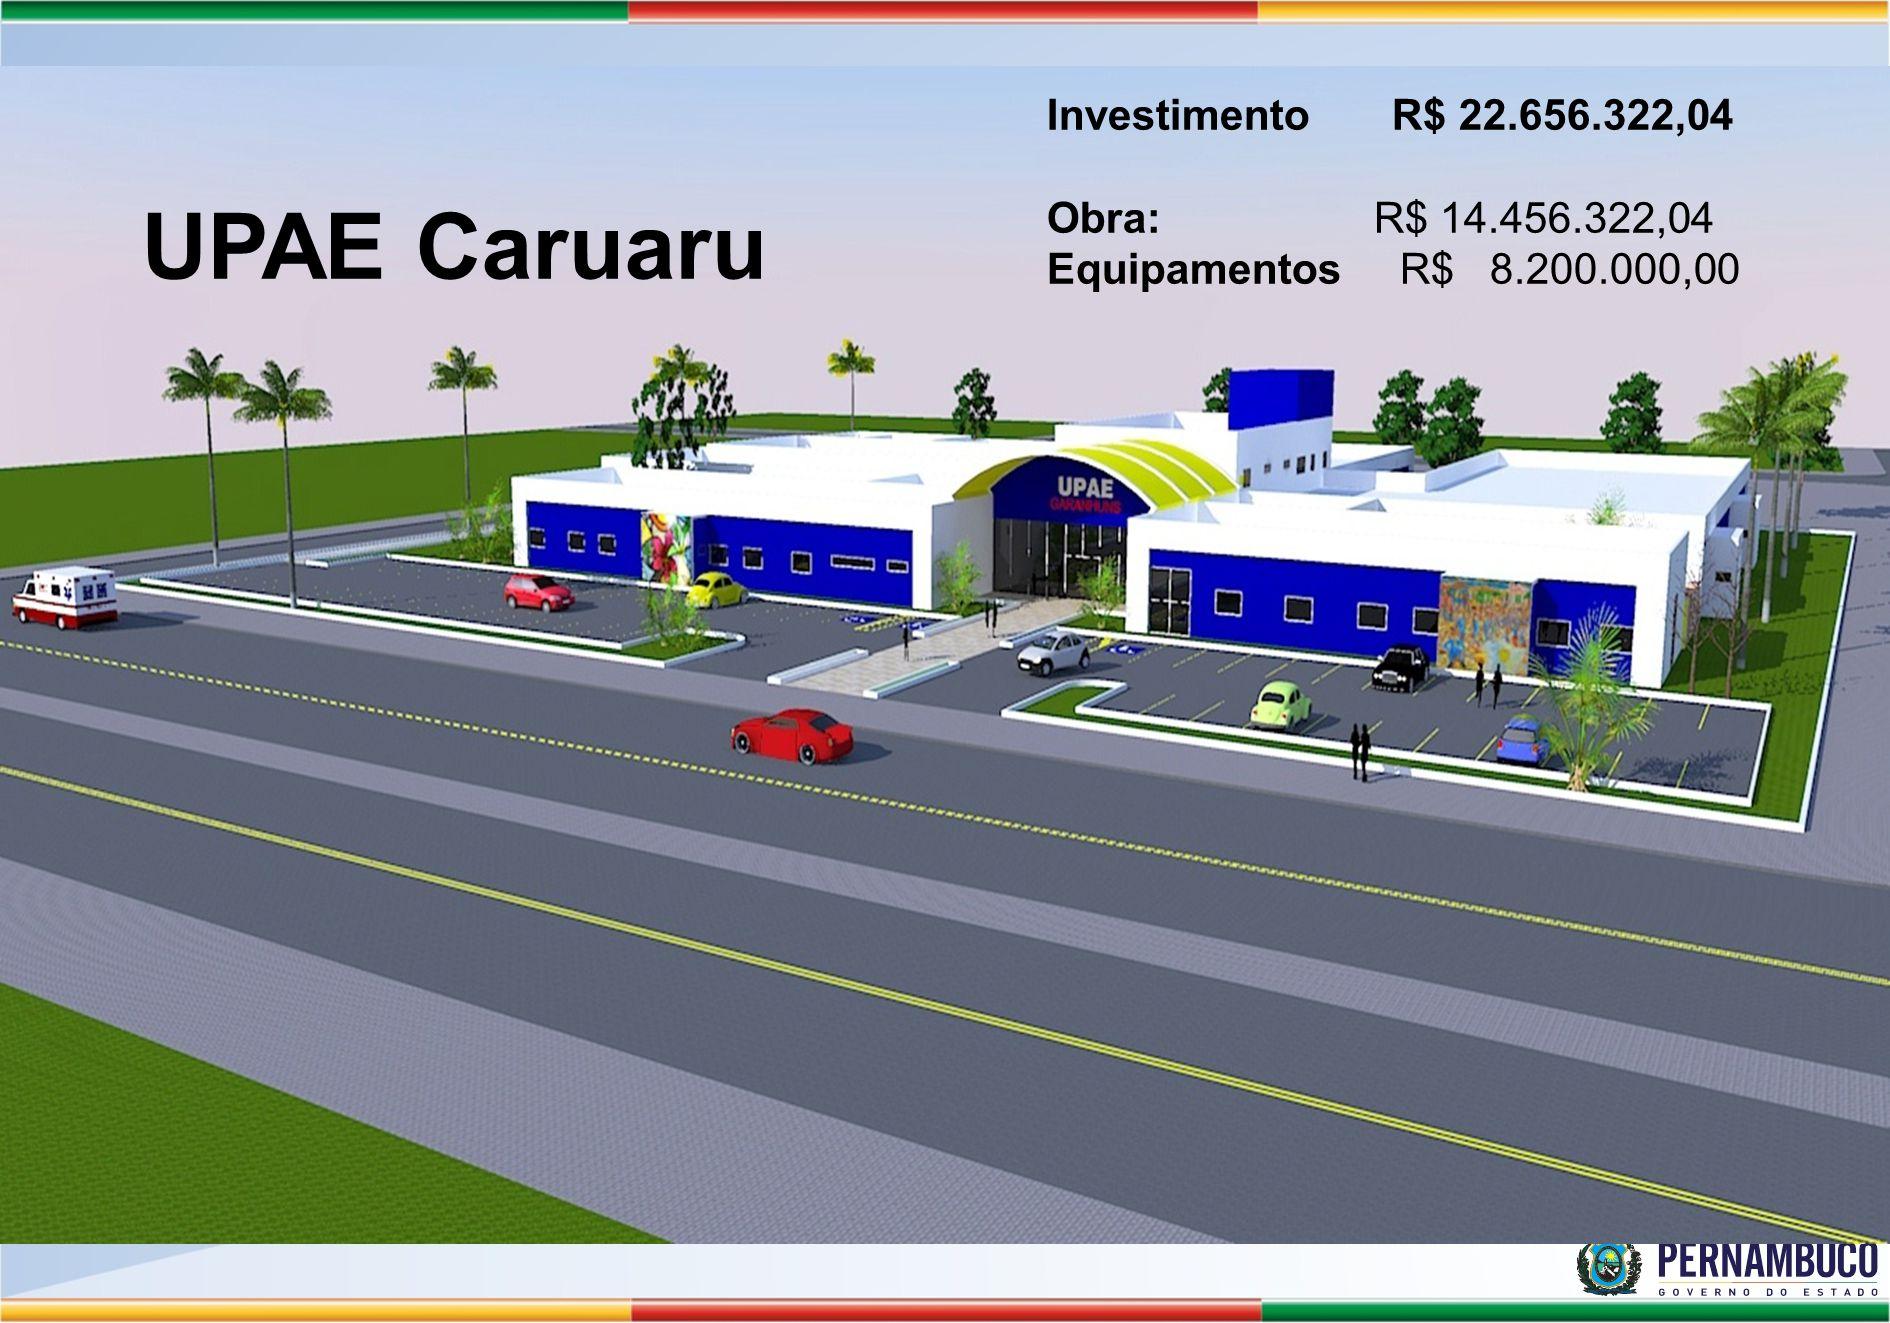 UPAE Caruaru Investimento R$ 22.656.322,04 Obra: R$ 14.456.322,04